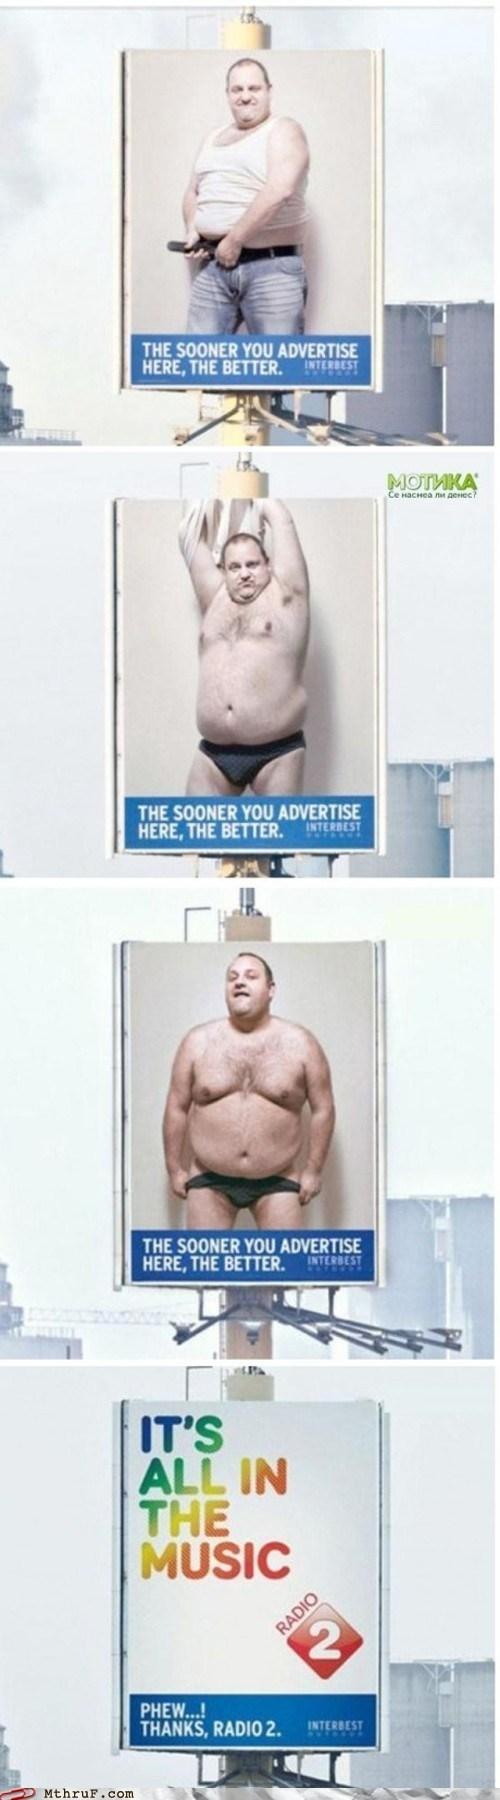 advertisement,advertising,billboard,fat guy,fat man